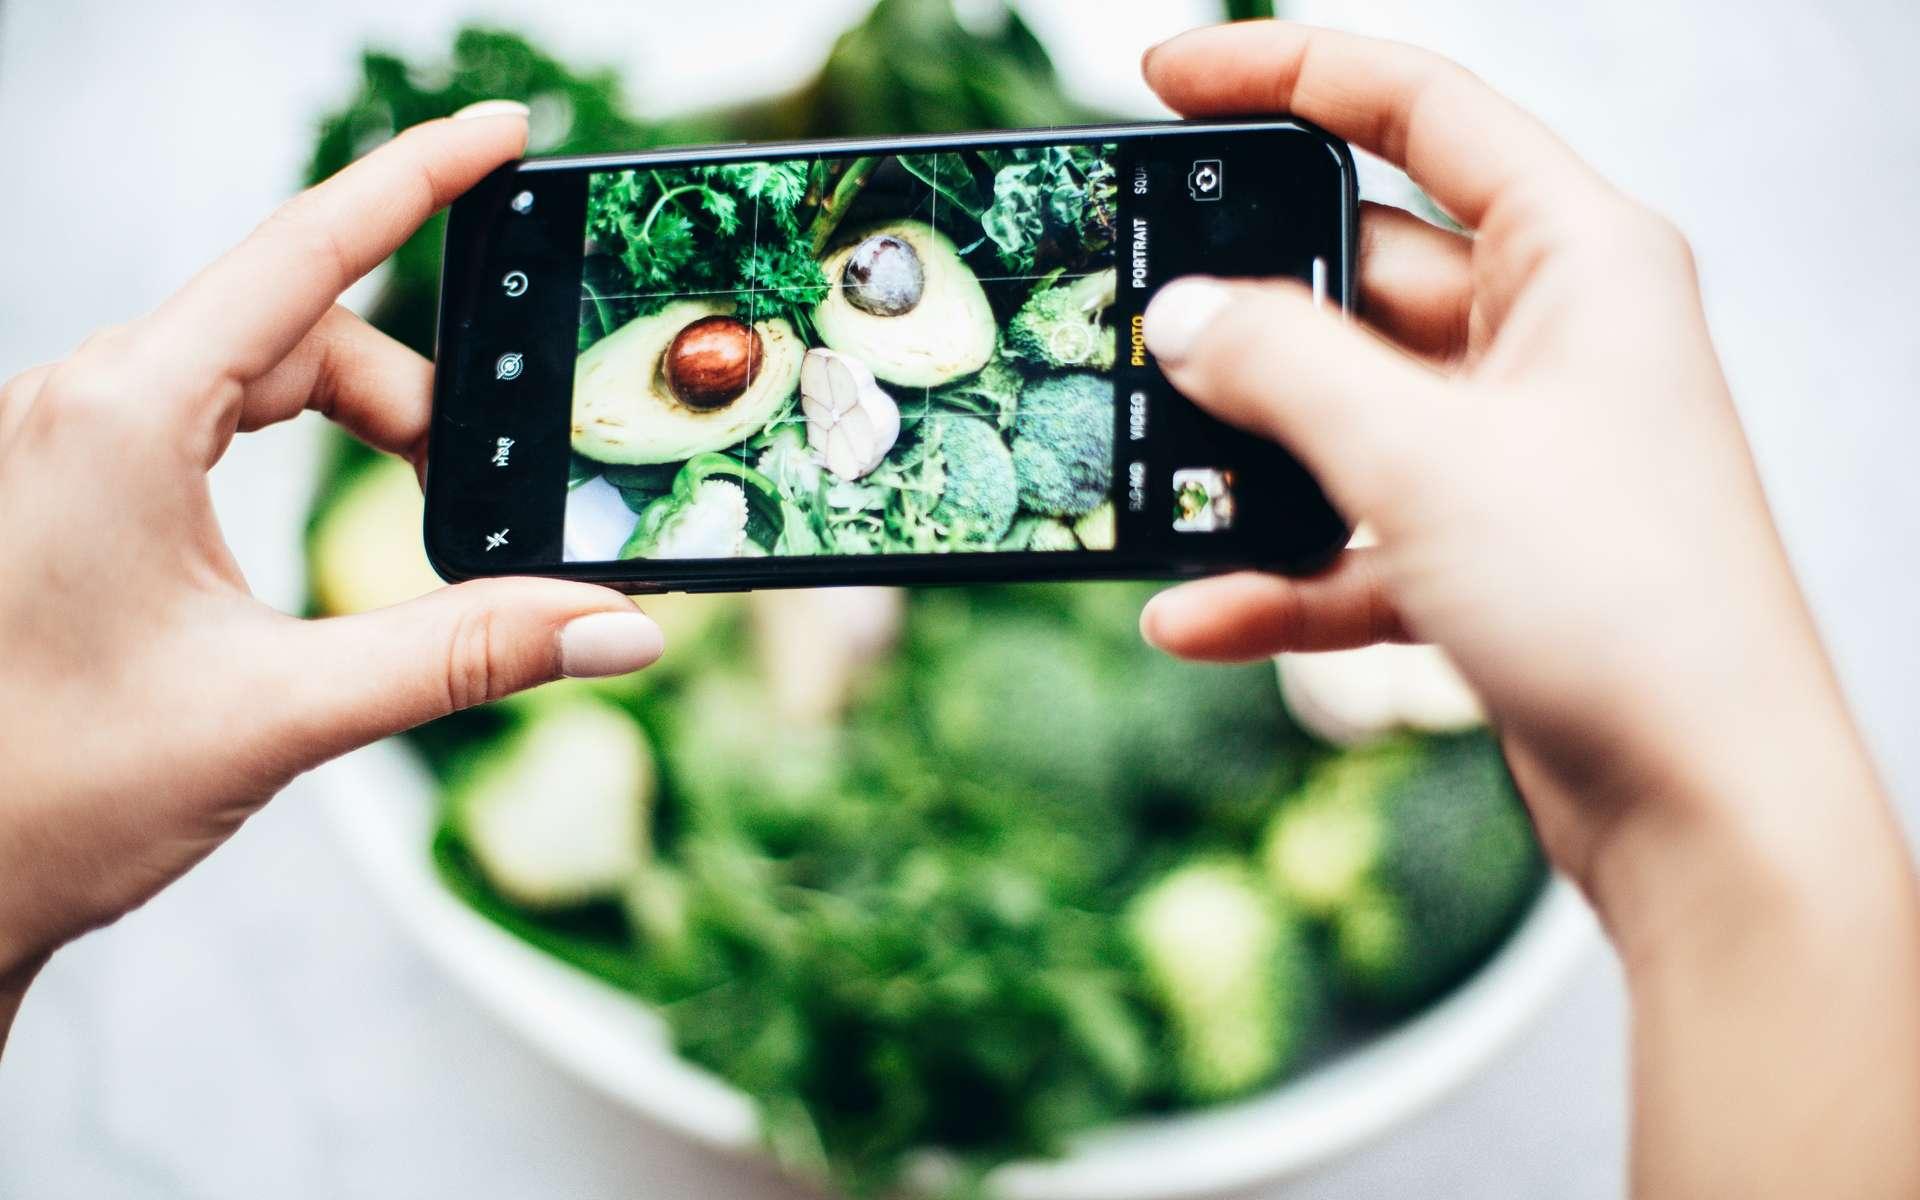 Comparatif des meilleurs smartphones photo © Daria Shevtsova, Pexels